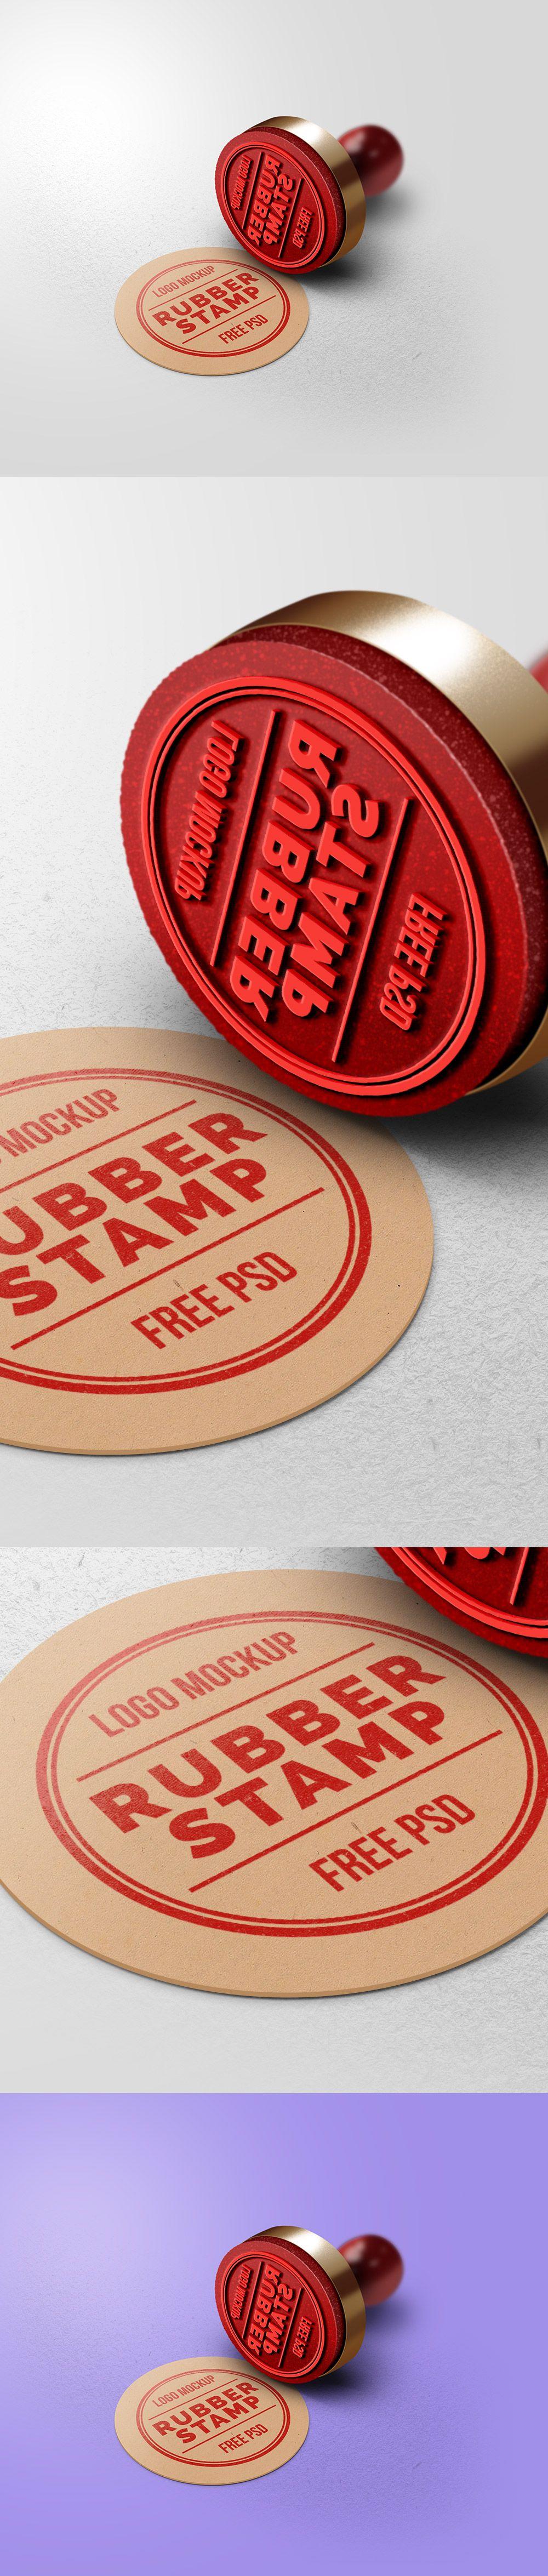 Free Rubber Stamp Logo Mockup (33.4 MB) Graphics Fuel